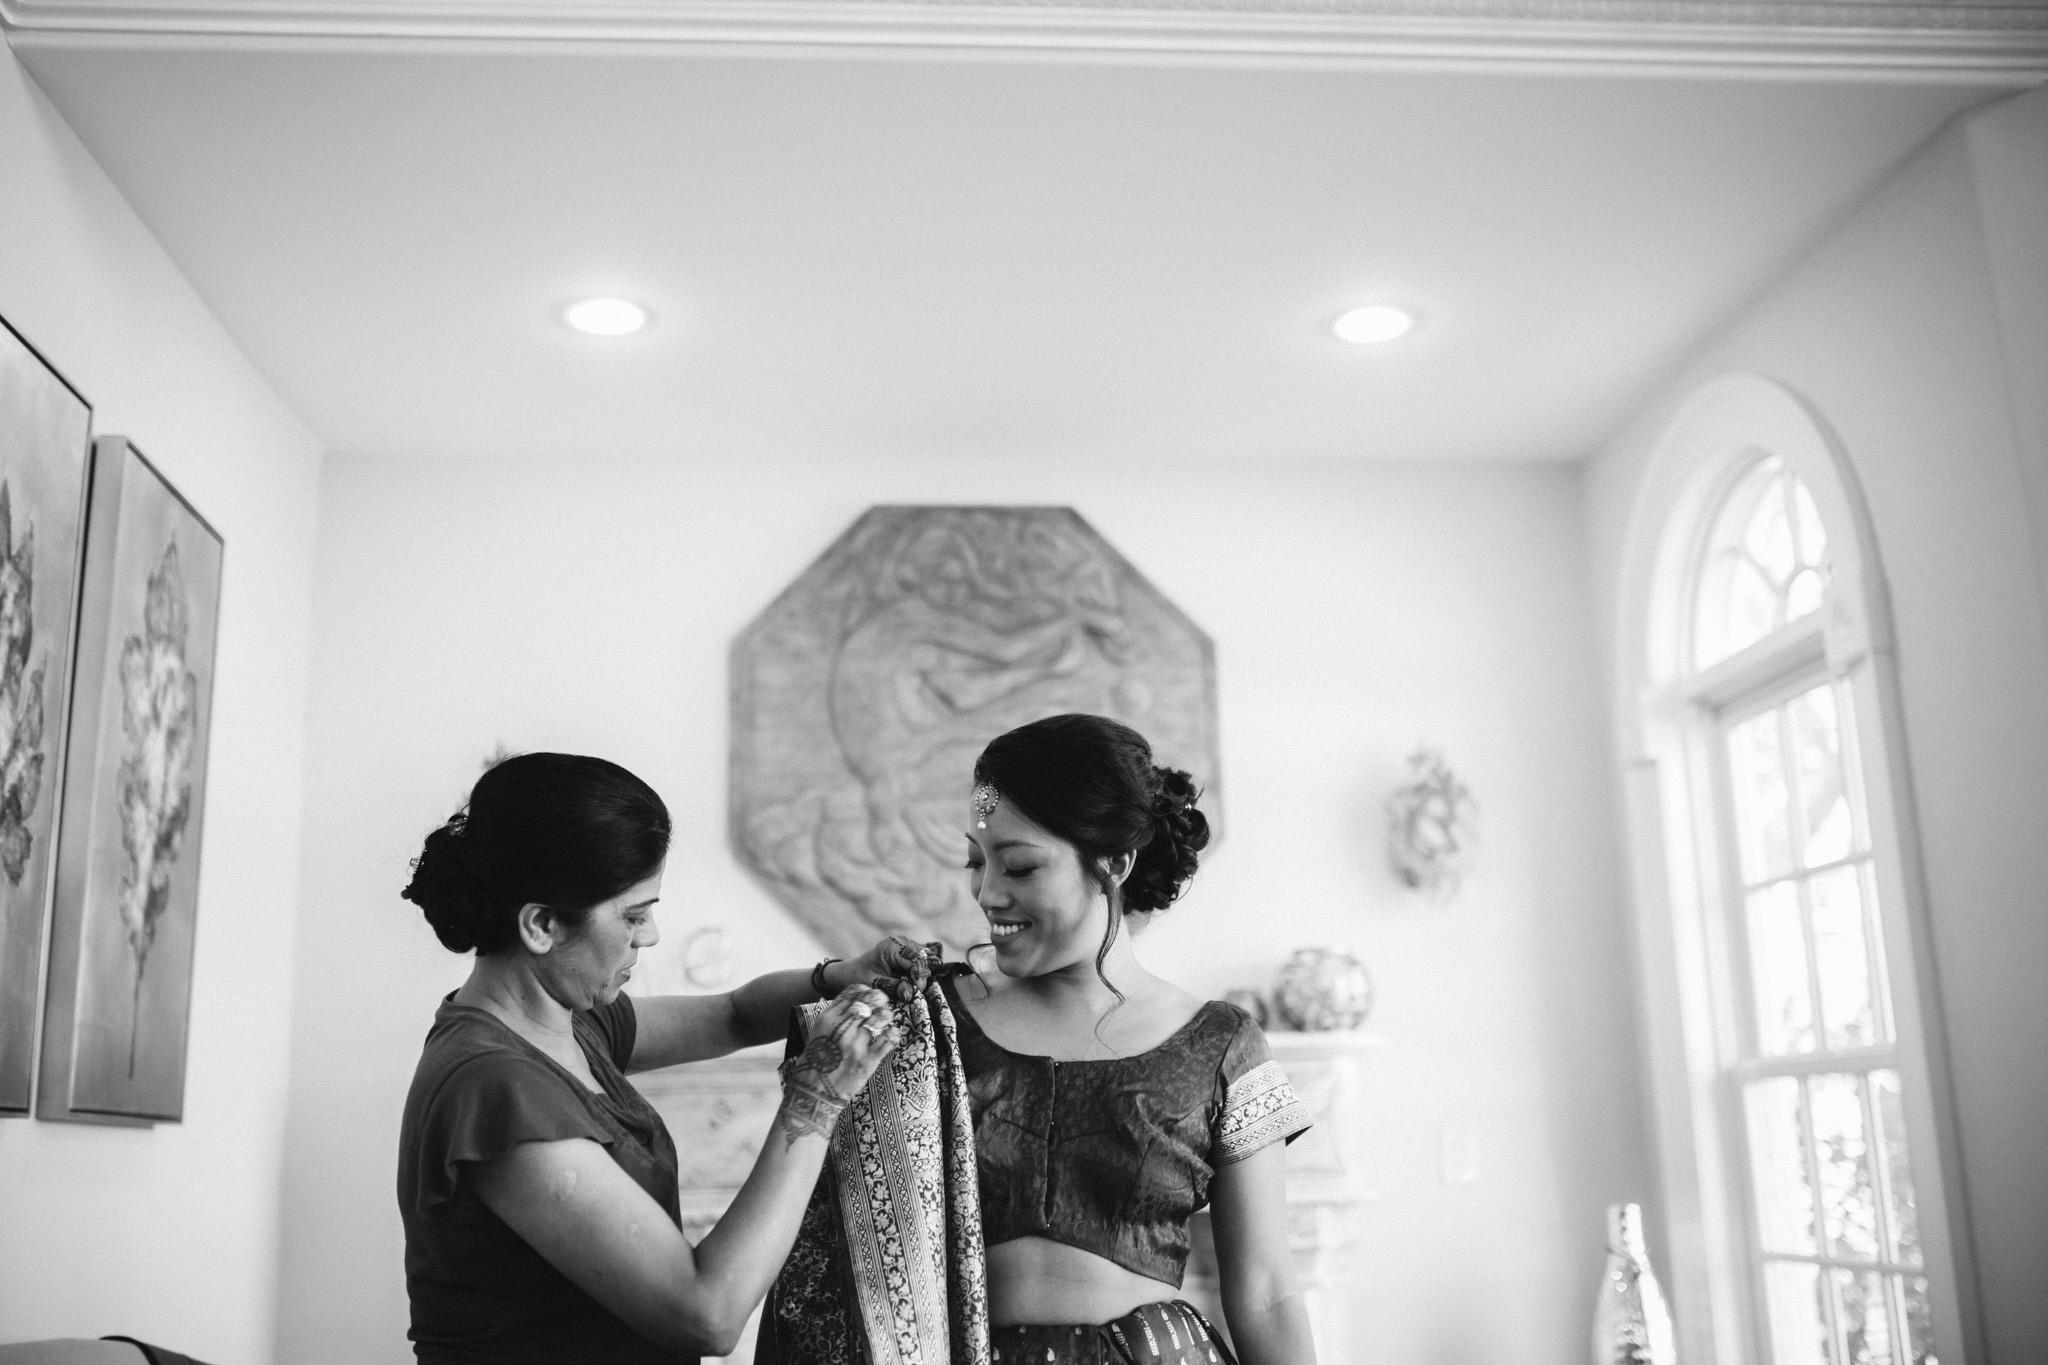 rebeccaburtphotography.hindiwedding.moraisvineyards.virginiawedding-22.JPG